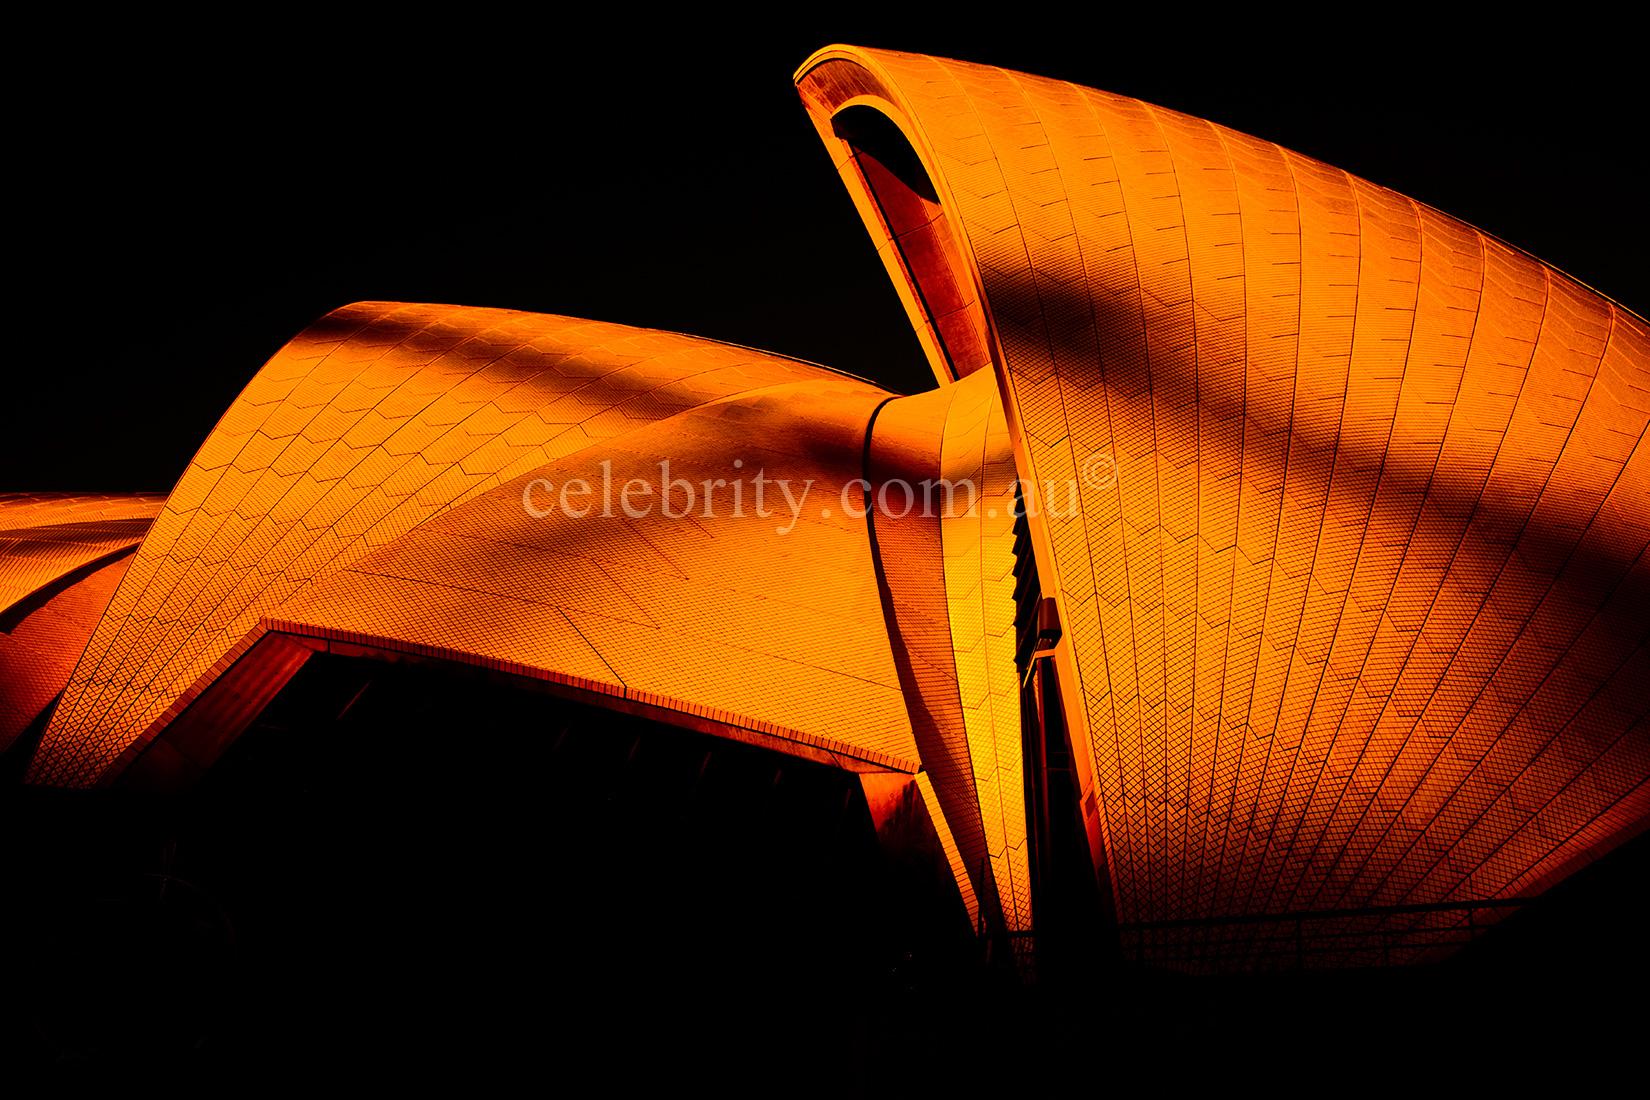 Shadow Over Sydney Opera House